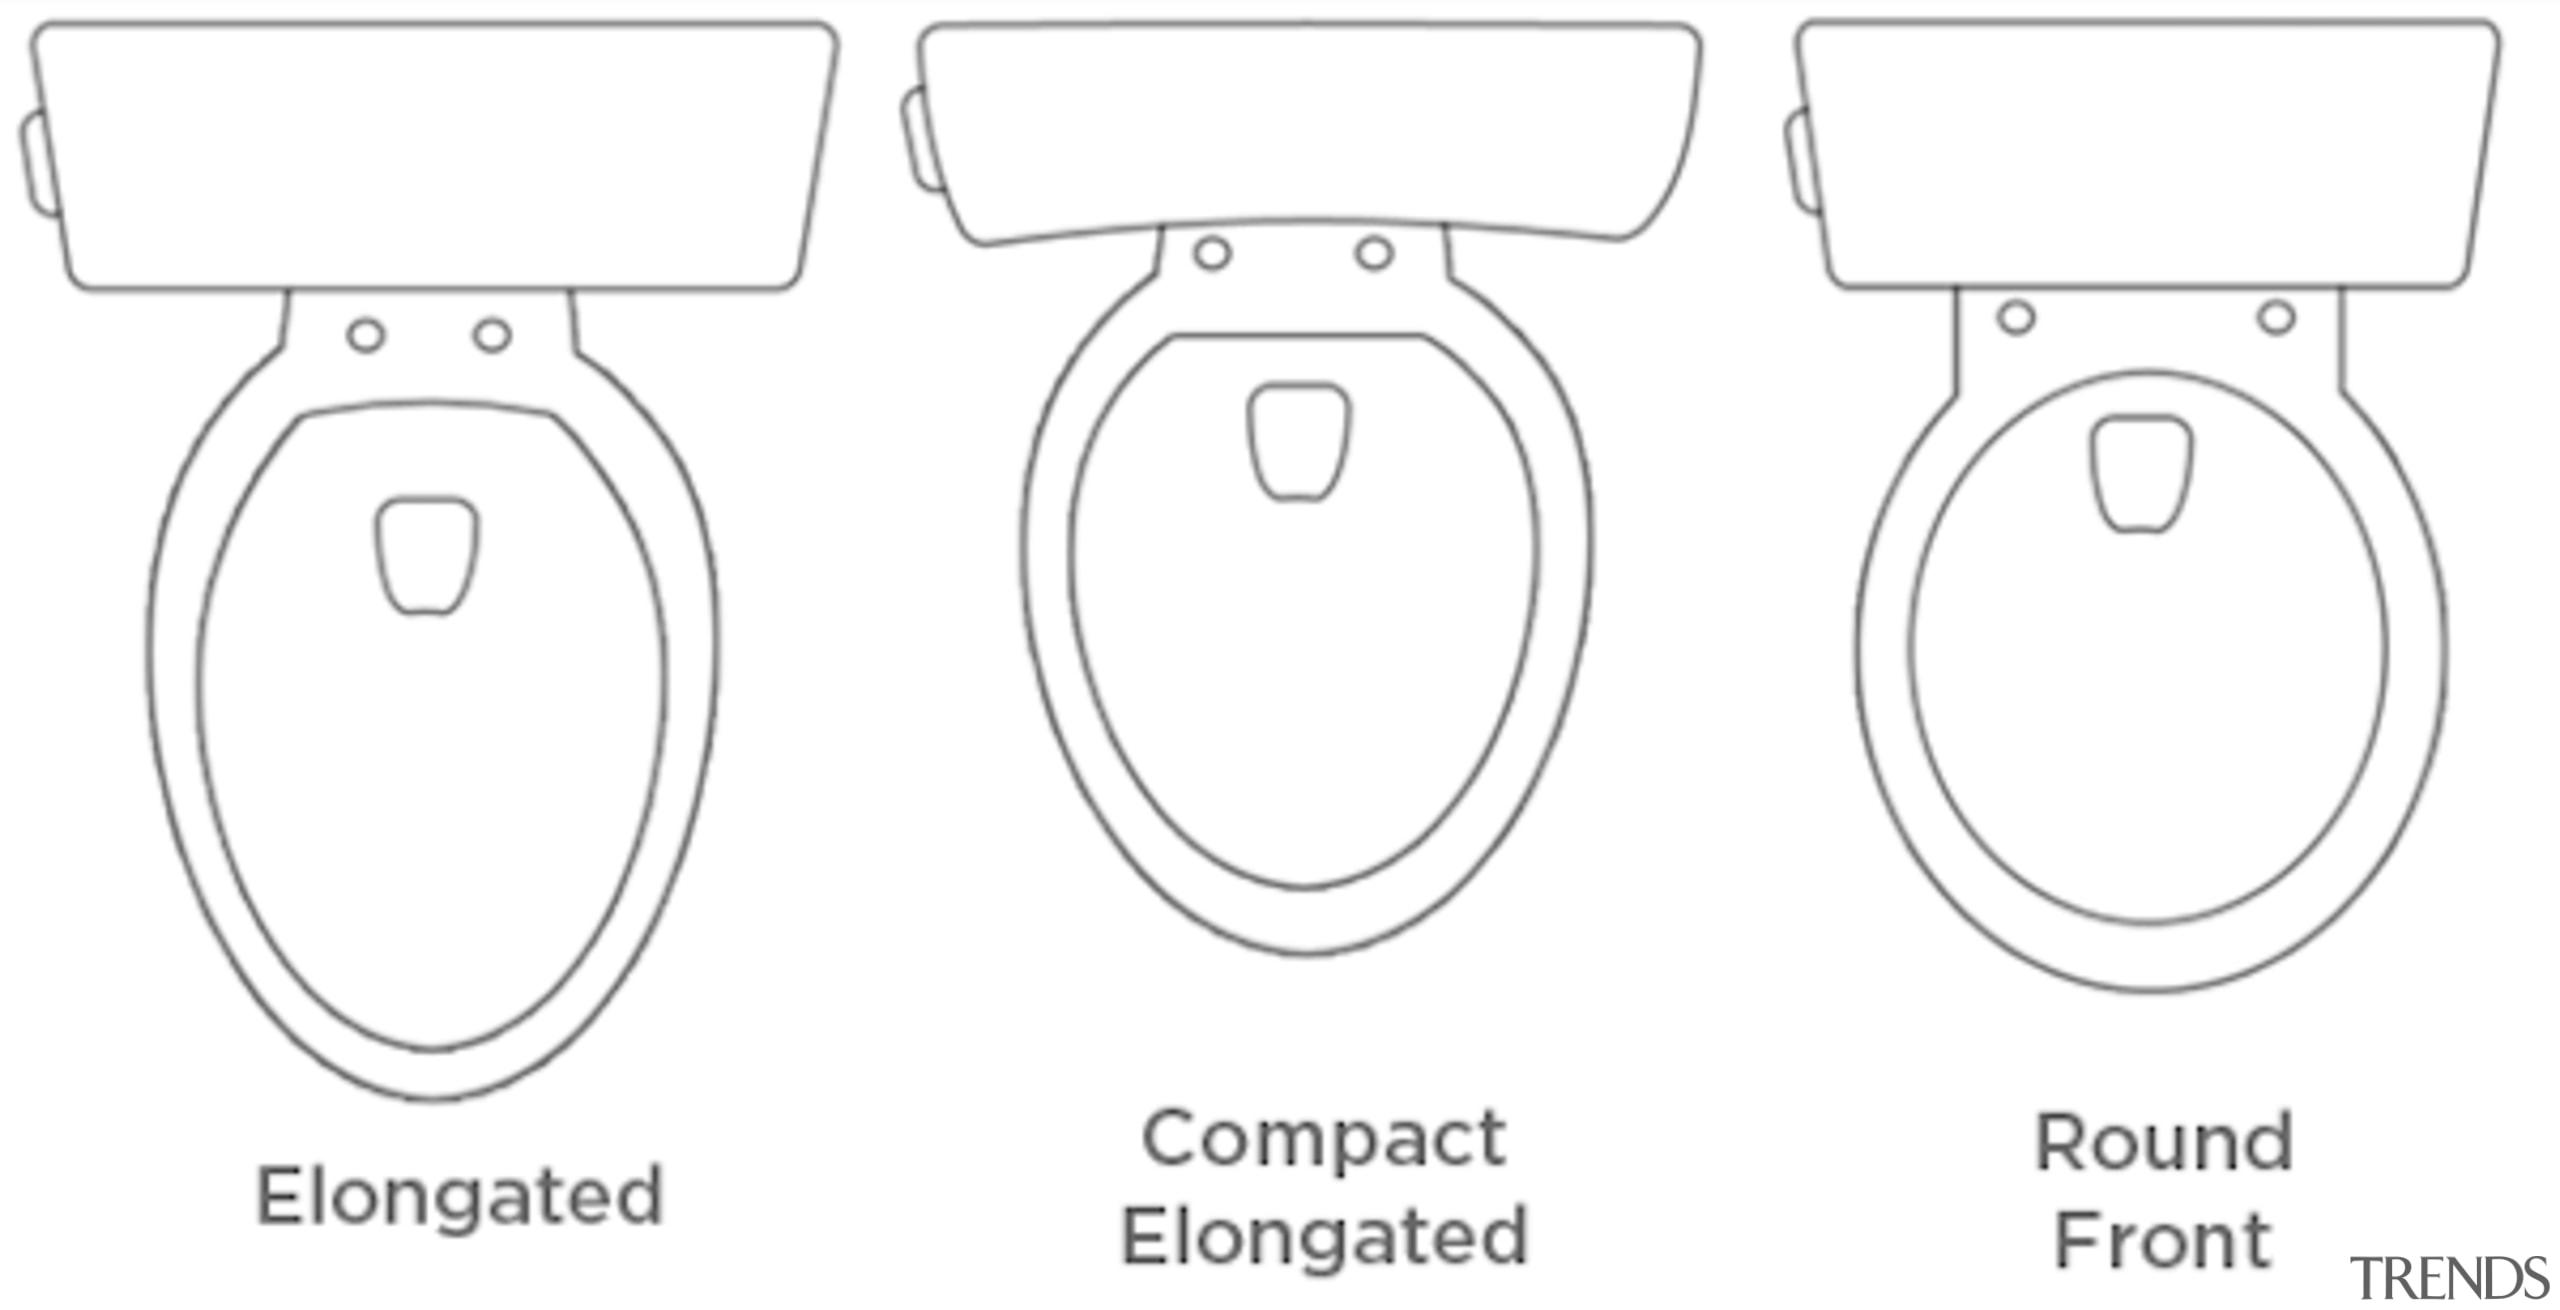 Toilet bowl styles - Choosing a new toilet circle, design, diagram, font, illustration, line, line art, text, white, white